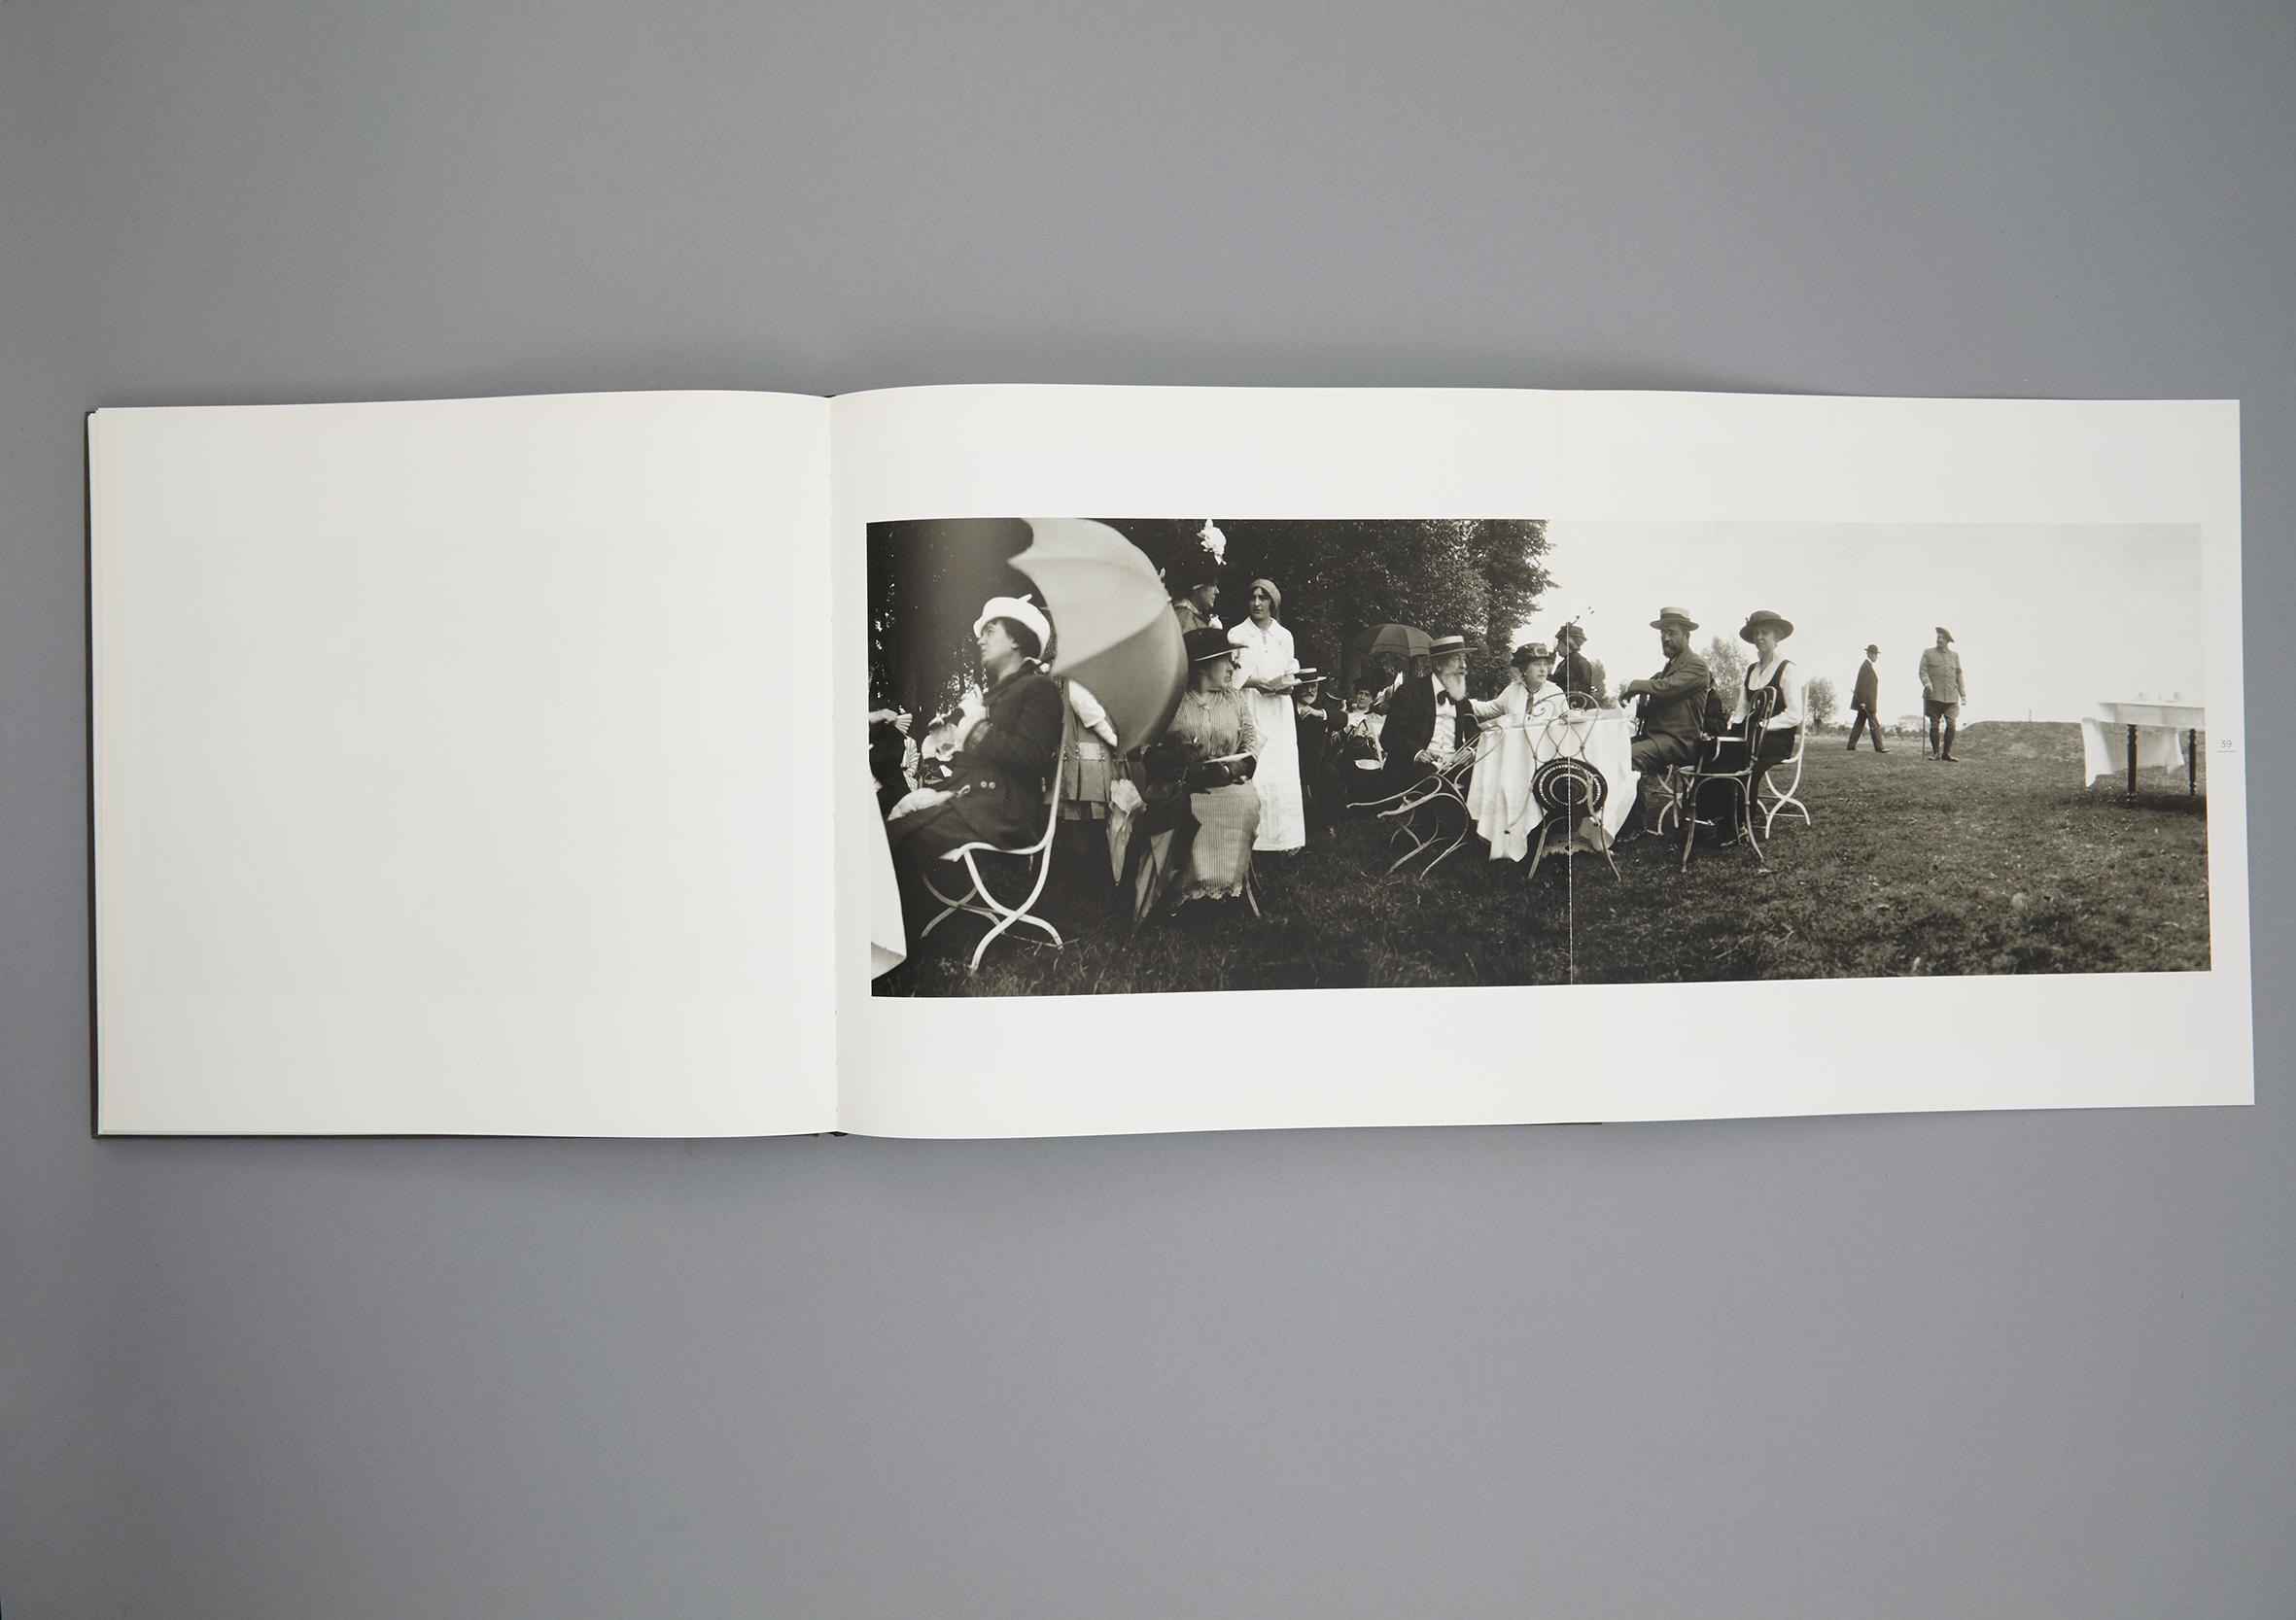 delpire-LARTIGUE-jacques-henri-photographe